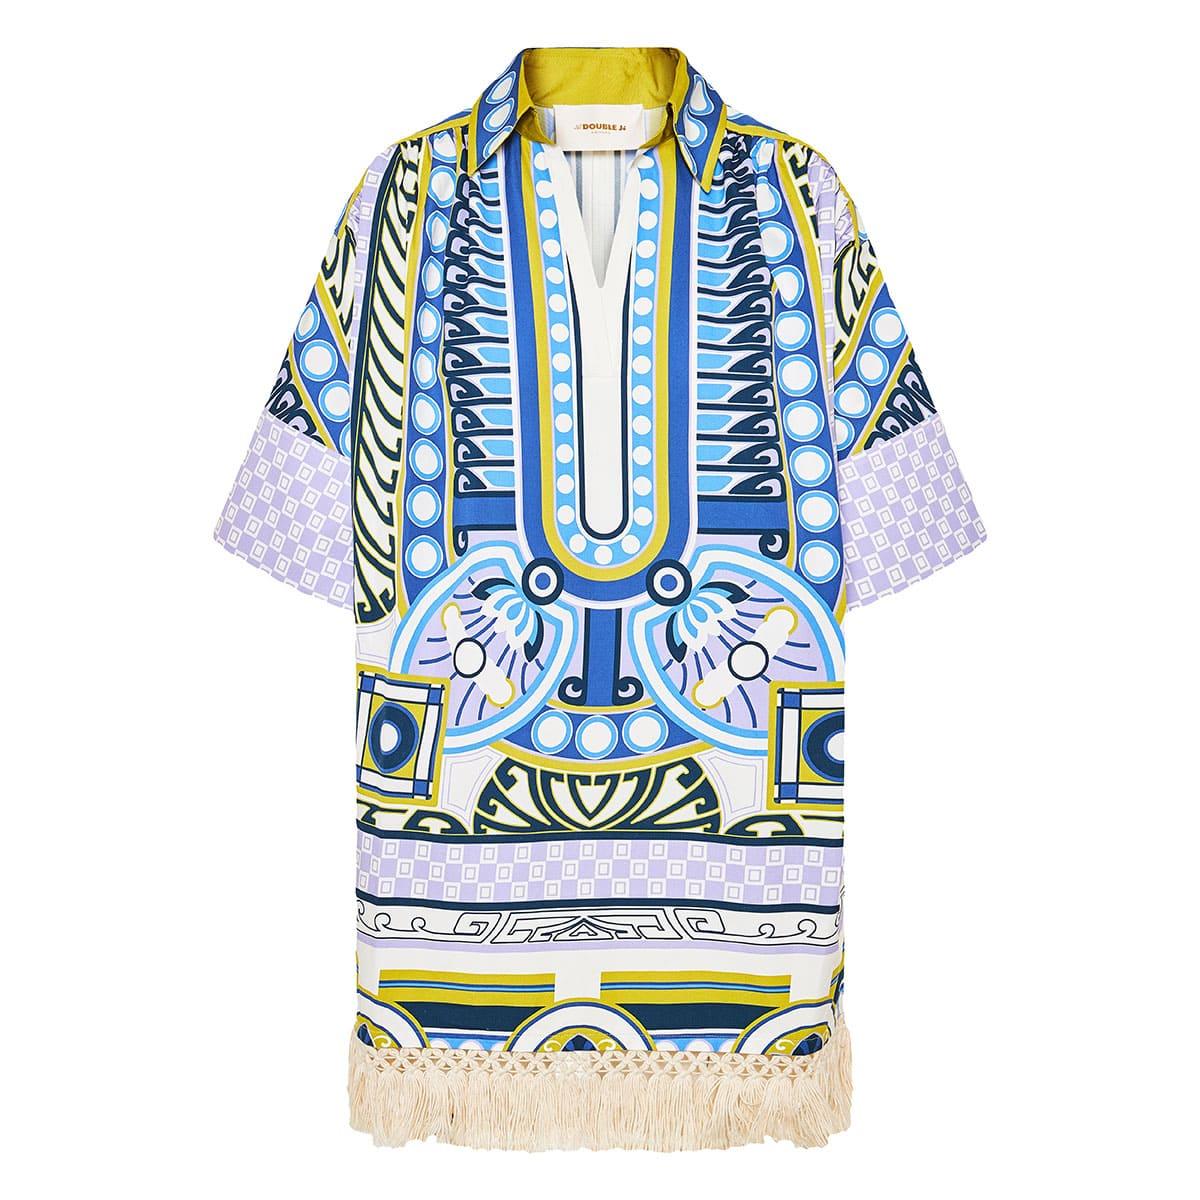 Honolulu printed tunic dress